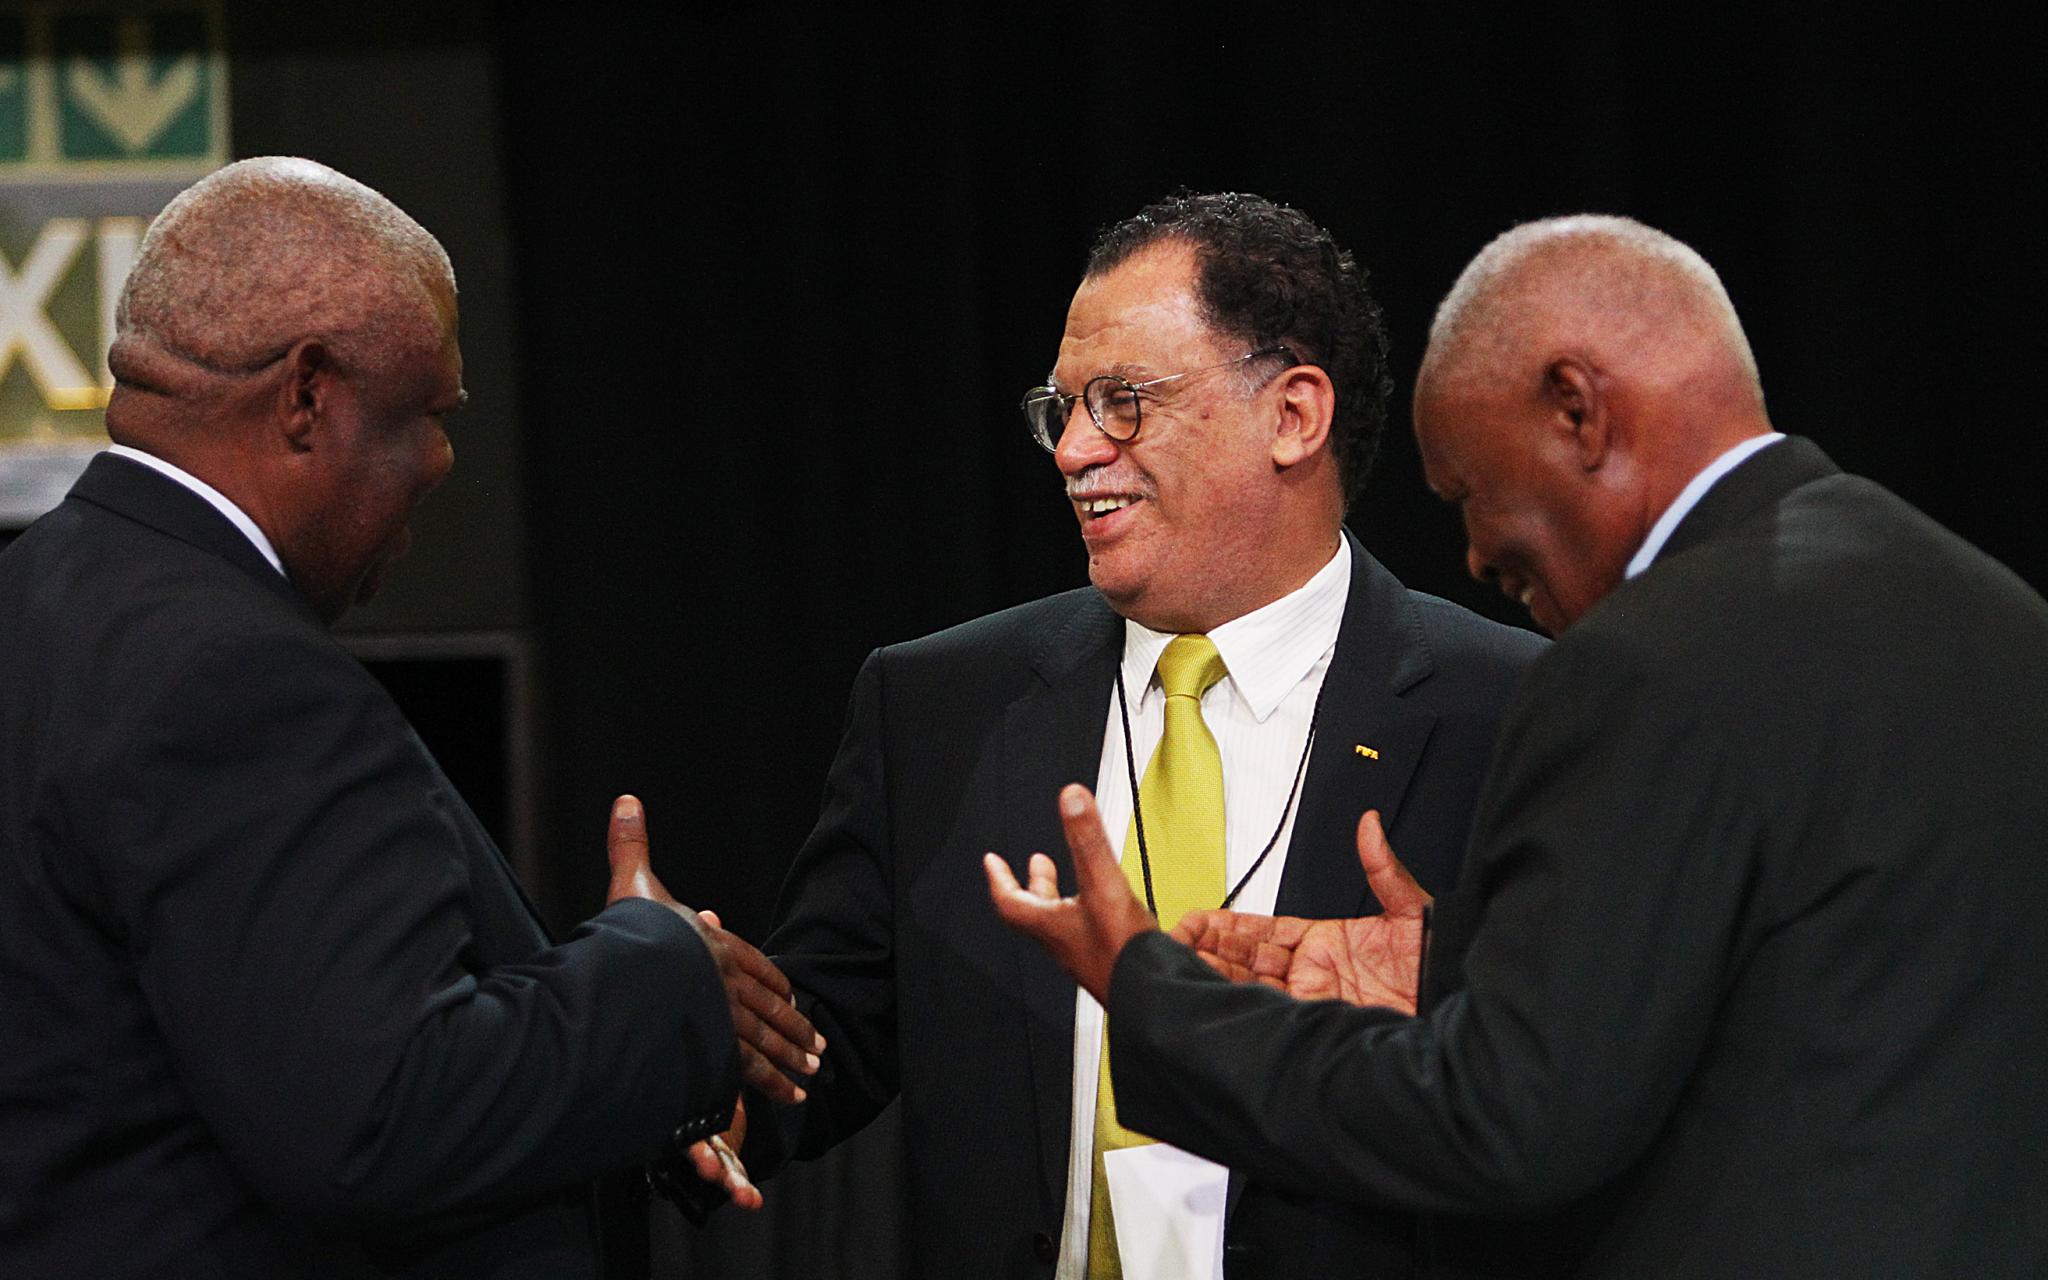 Jordaan re-elected South African Football Association President despite controversies